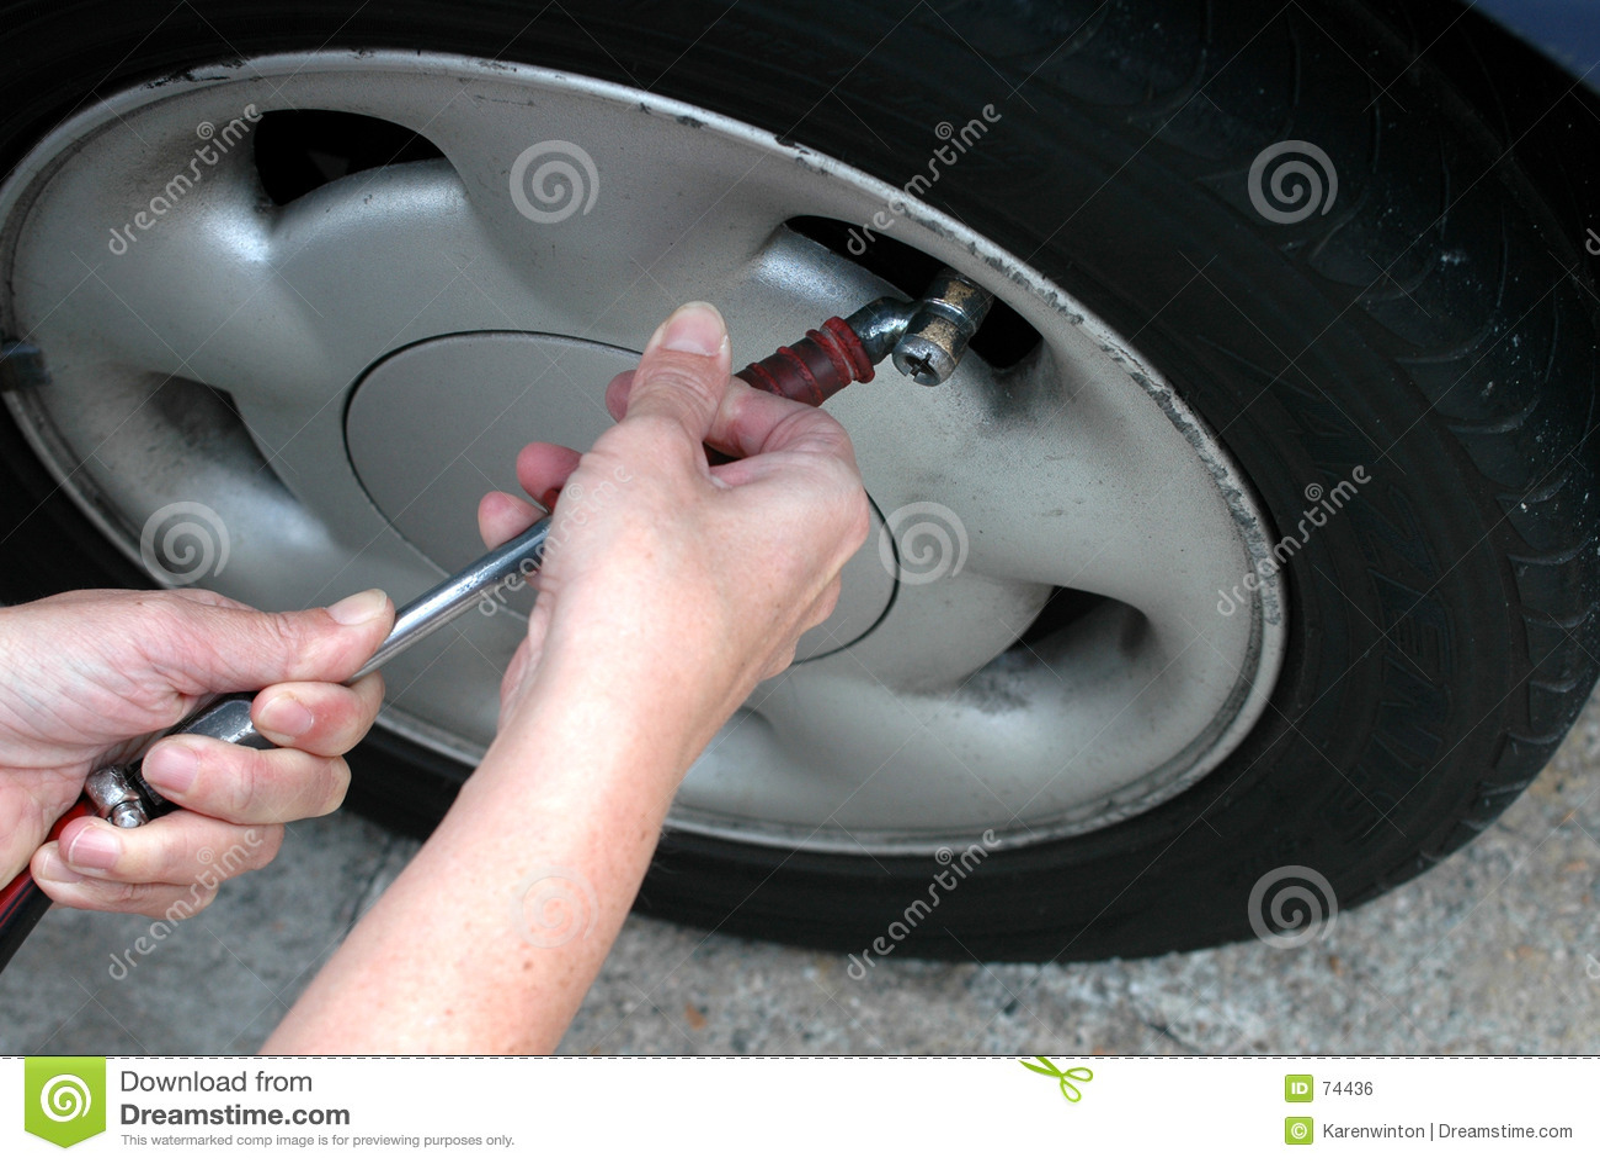 Contrôle de la pression de pneu